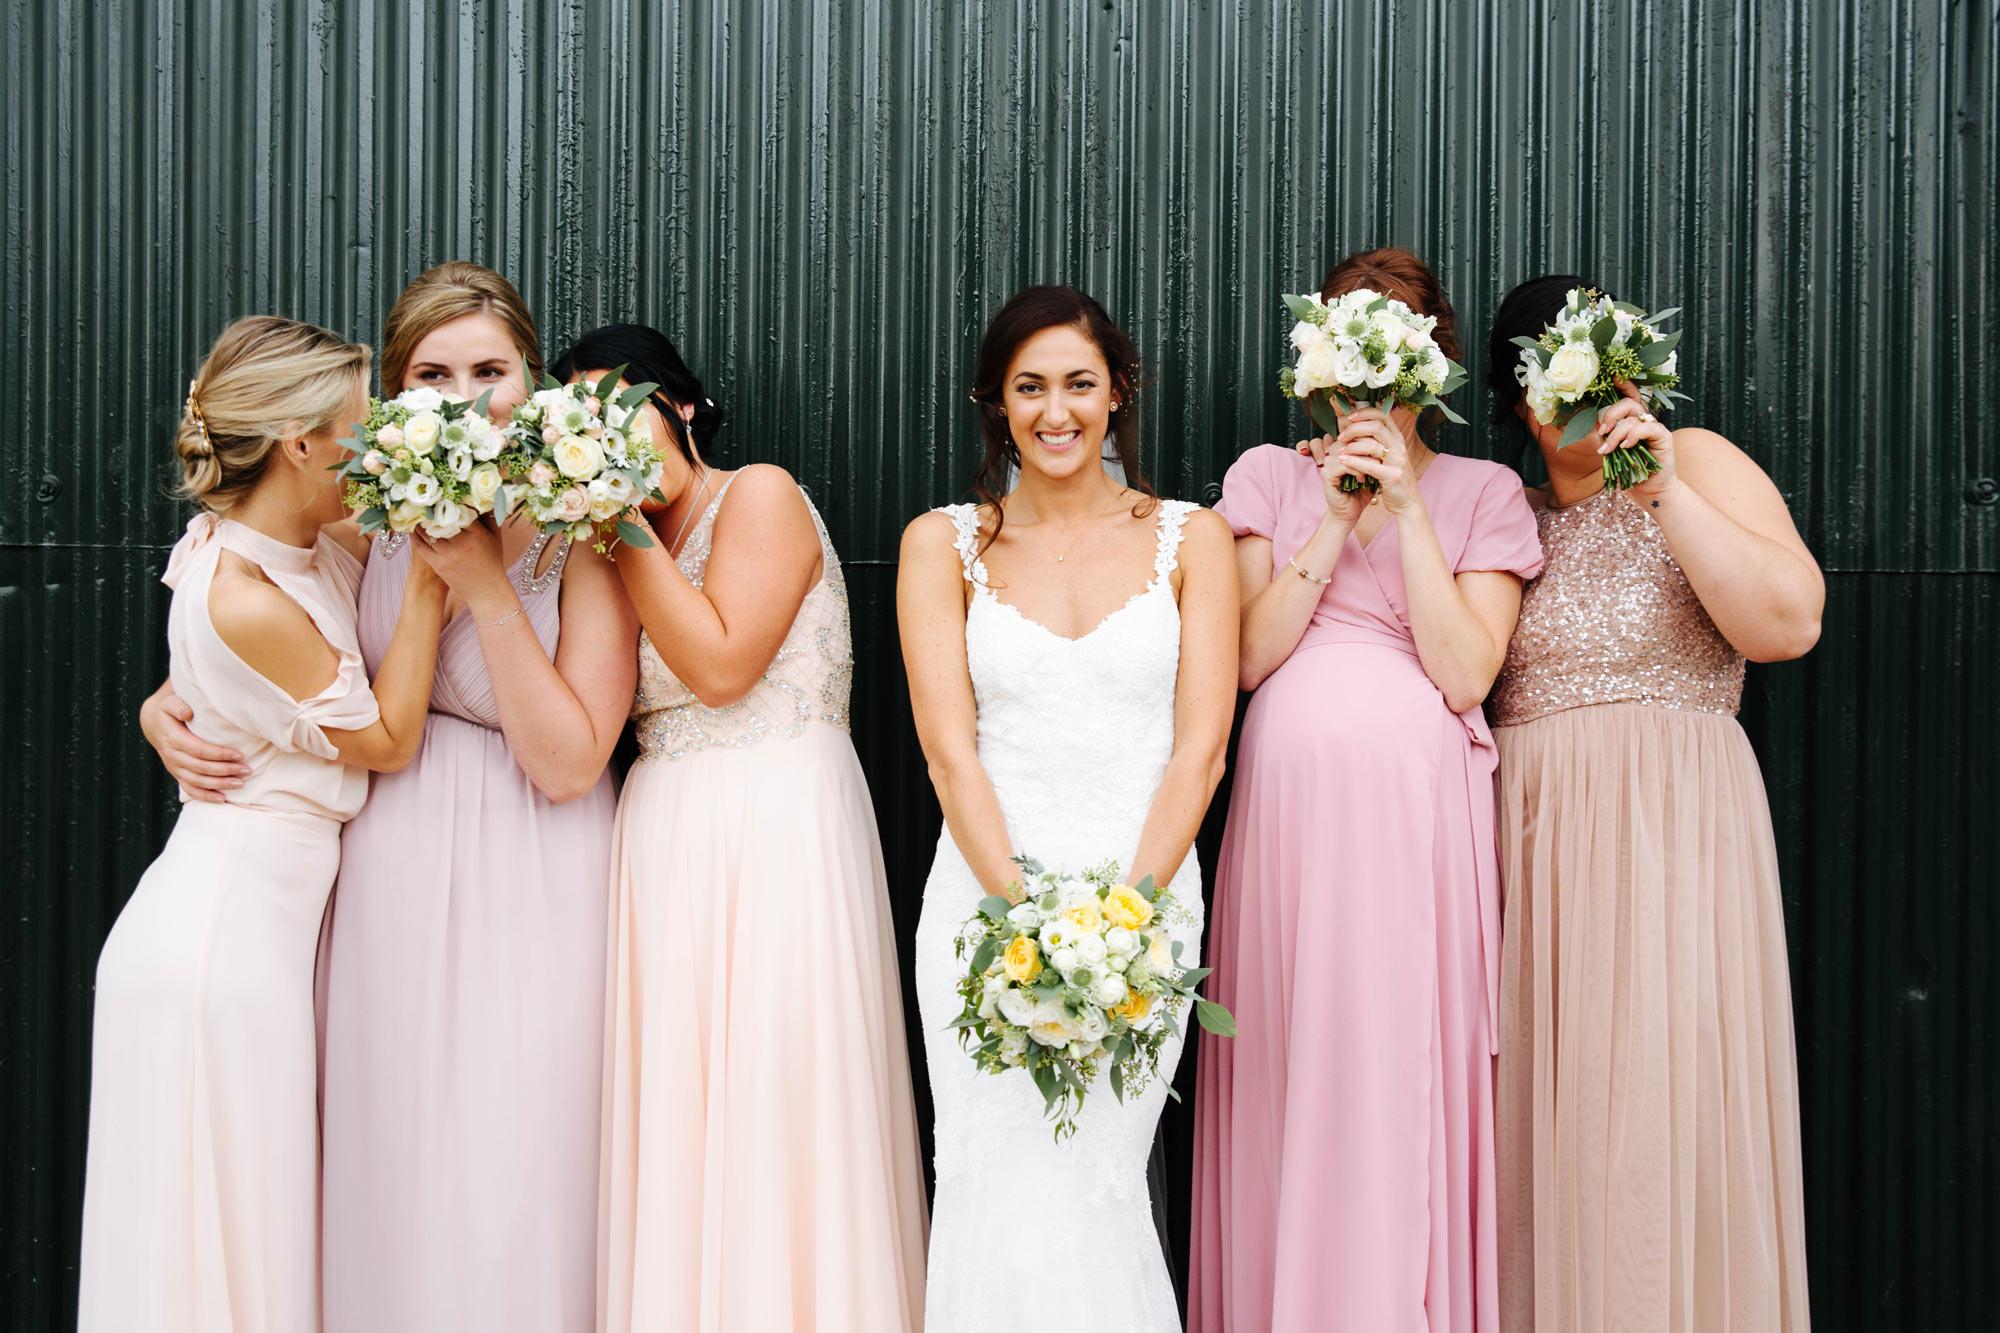 BeckyLee-wedding5.jpg